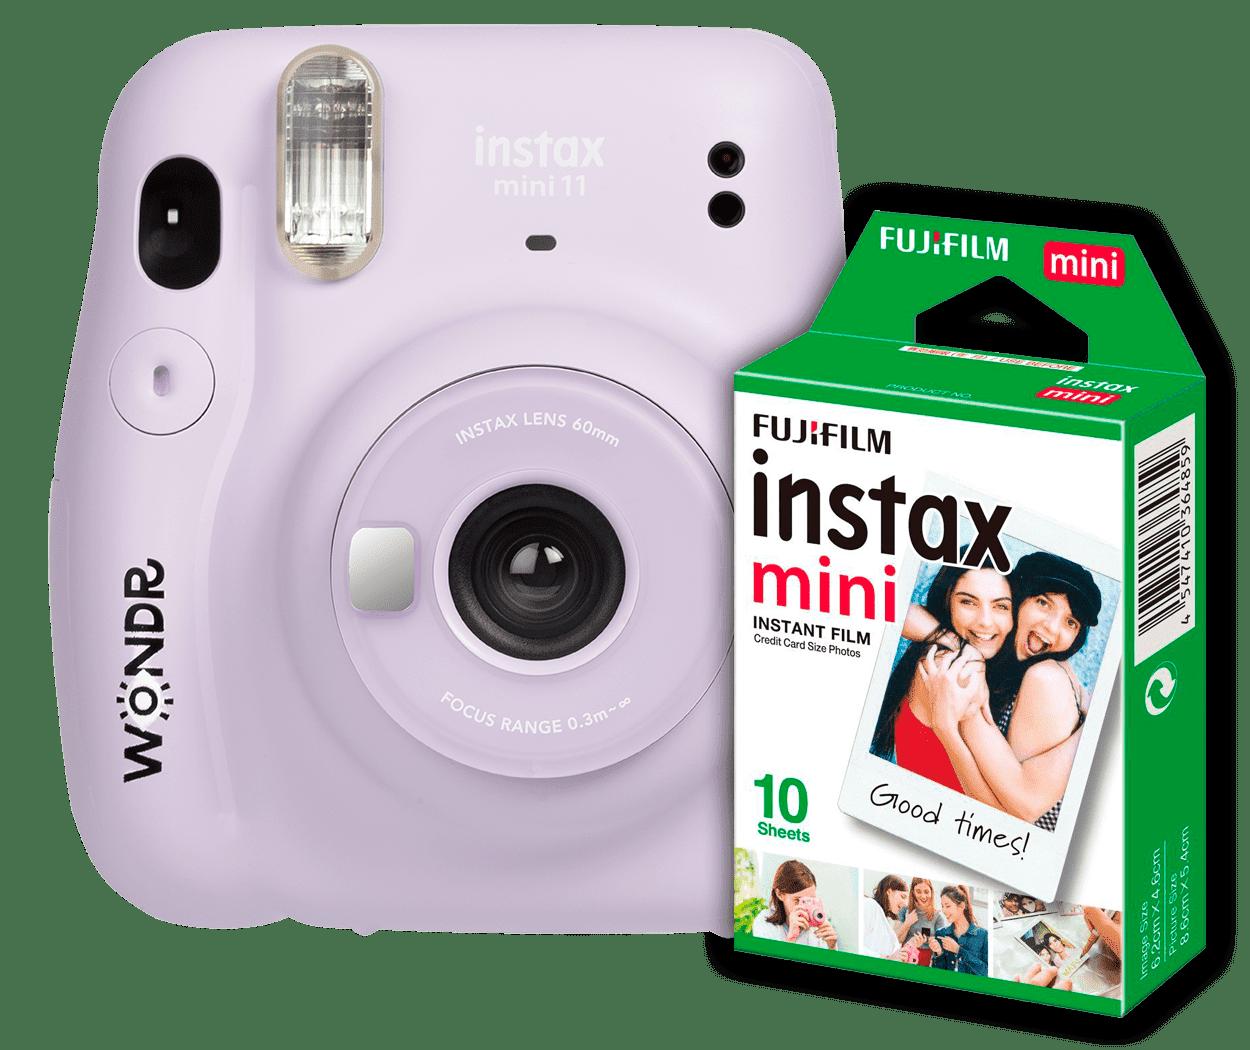 instax-mini-11-WONDR-purple-enkelpak-voorkant